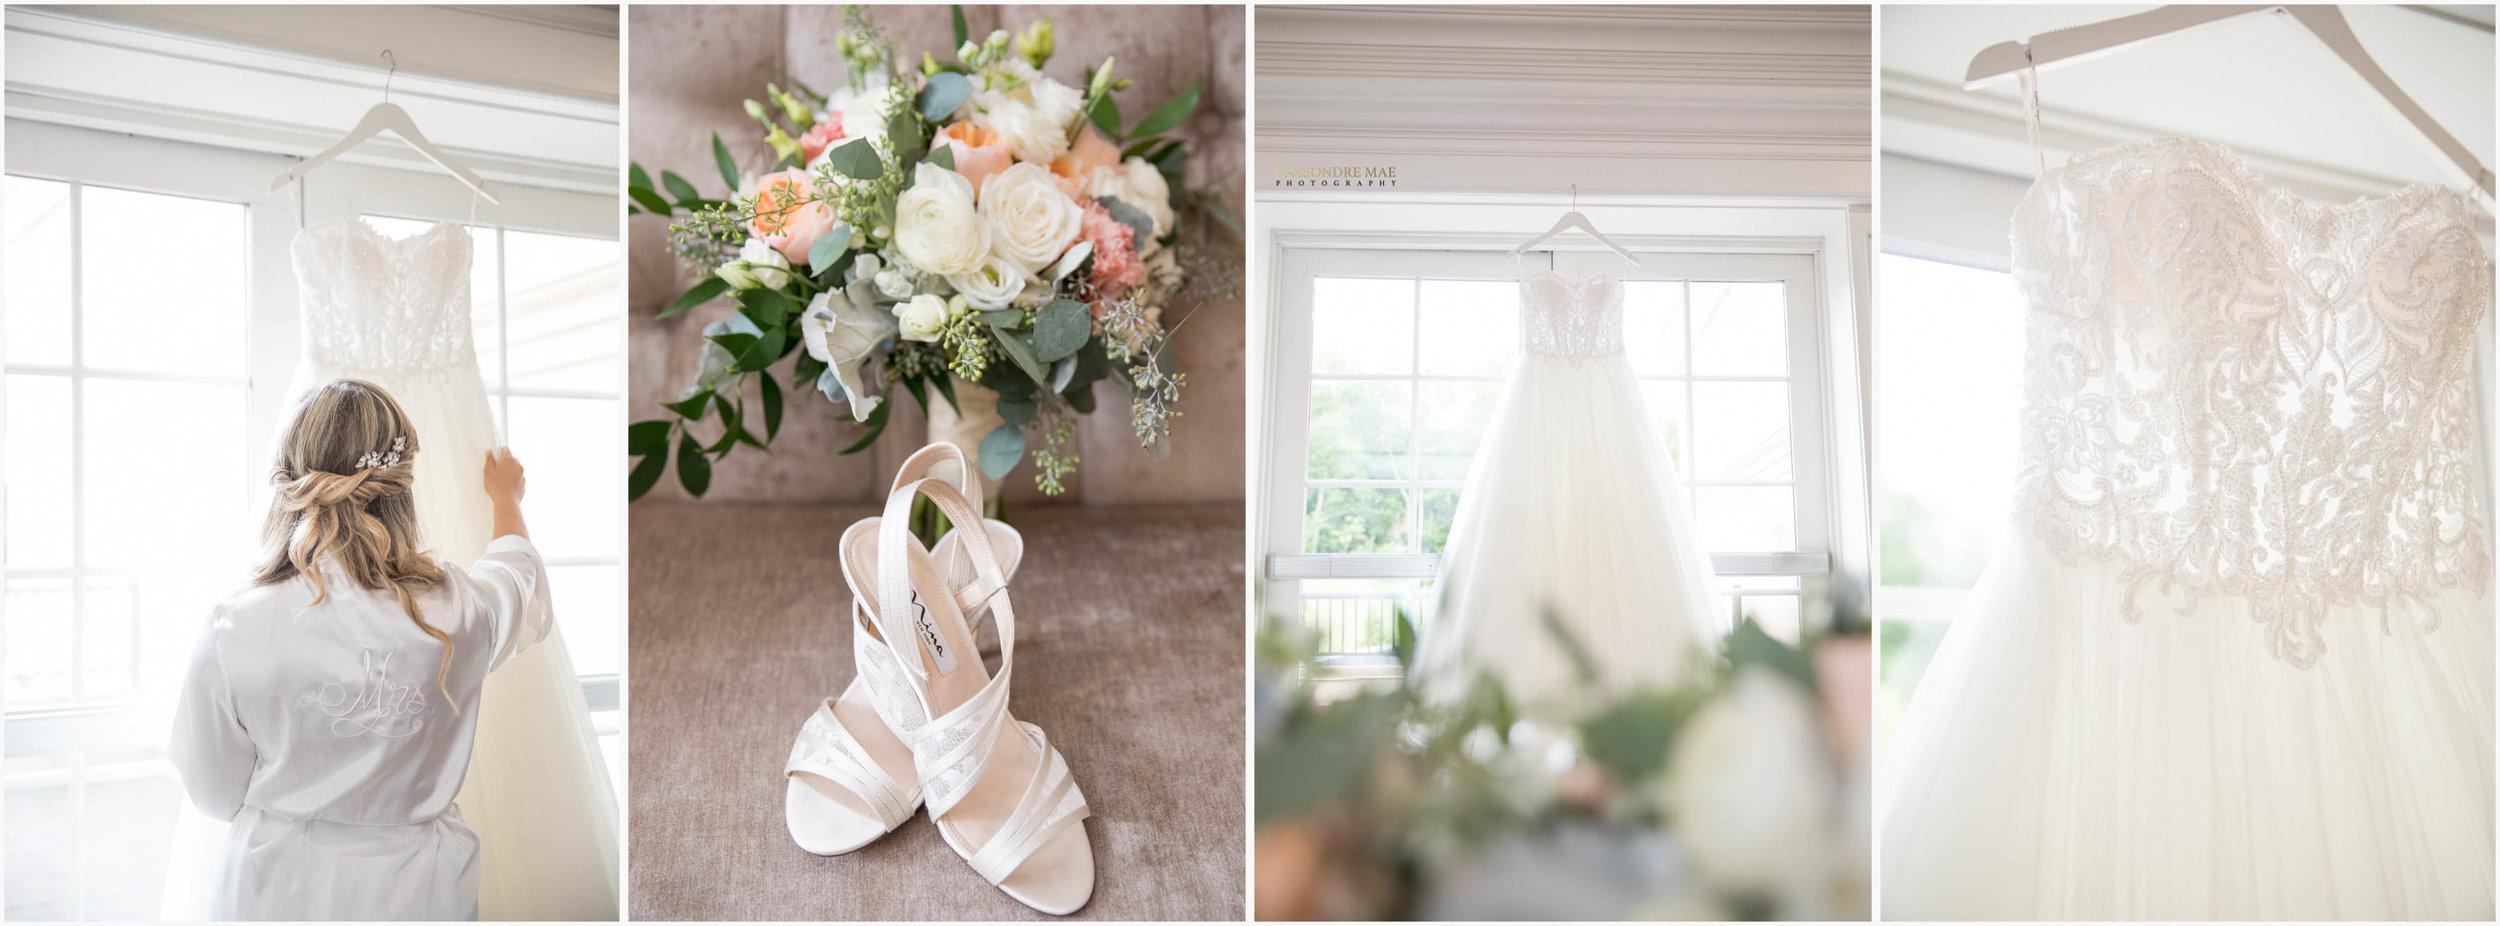 Cassondre Mae Photography Hudson Valley NY Wedding Photographer -2.jpg